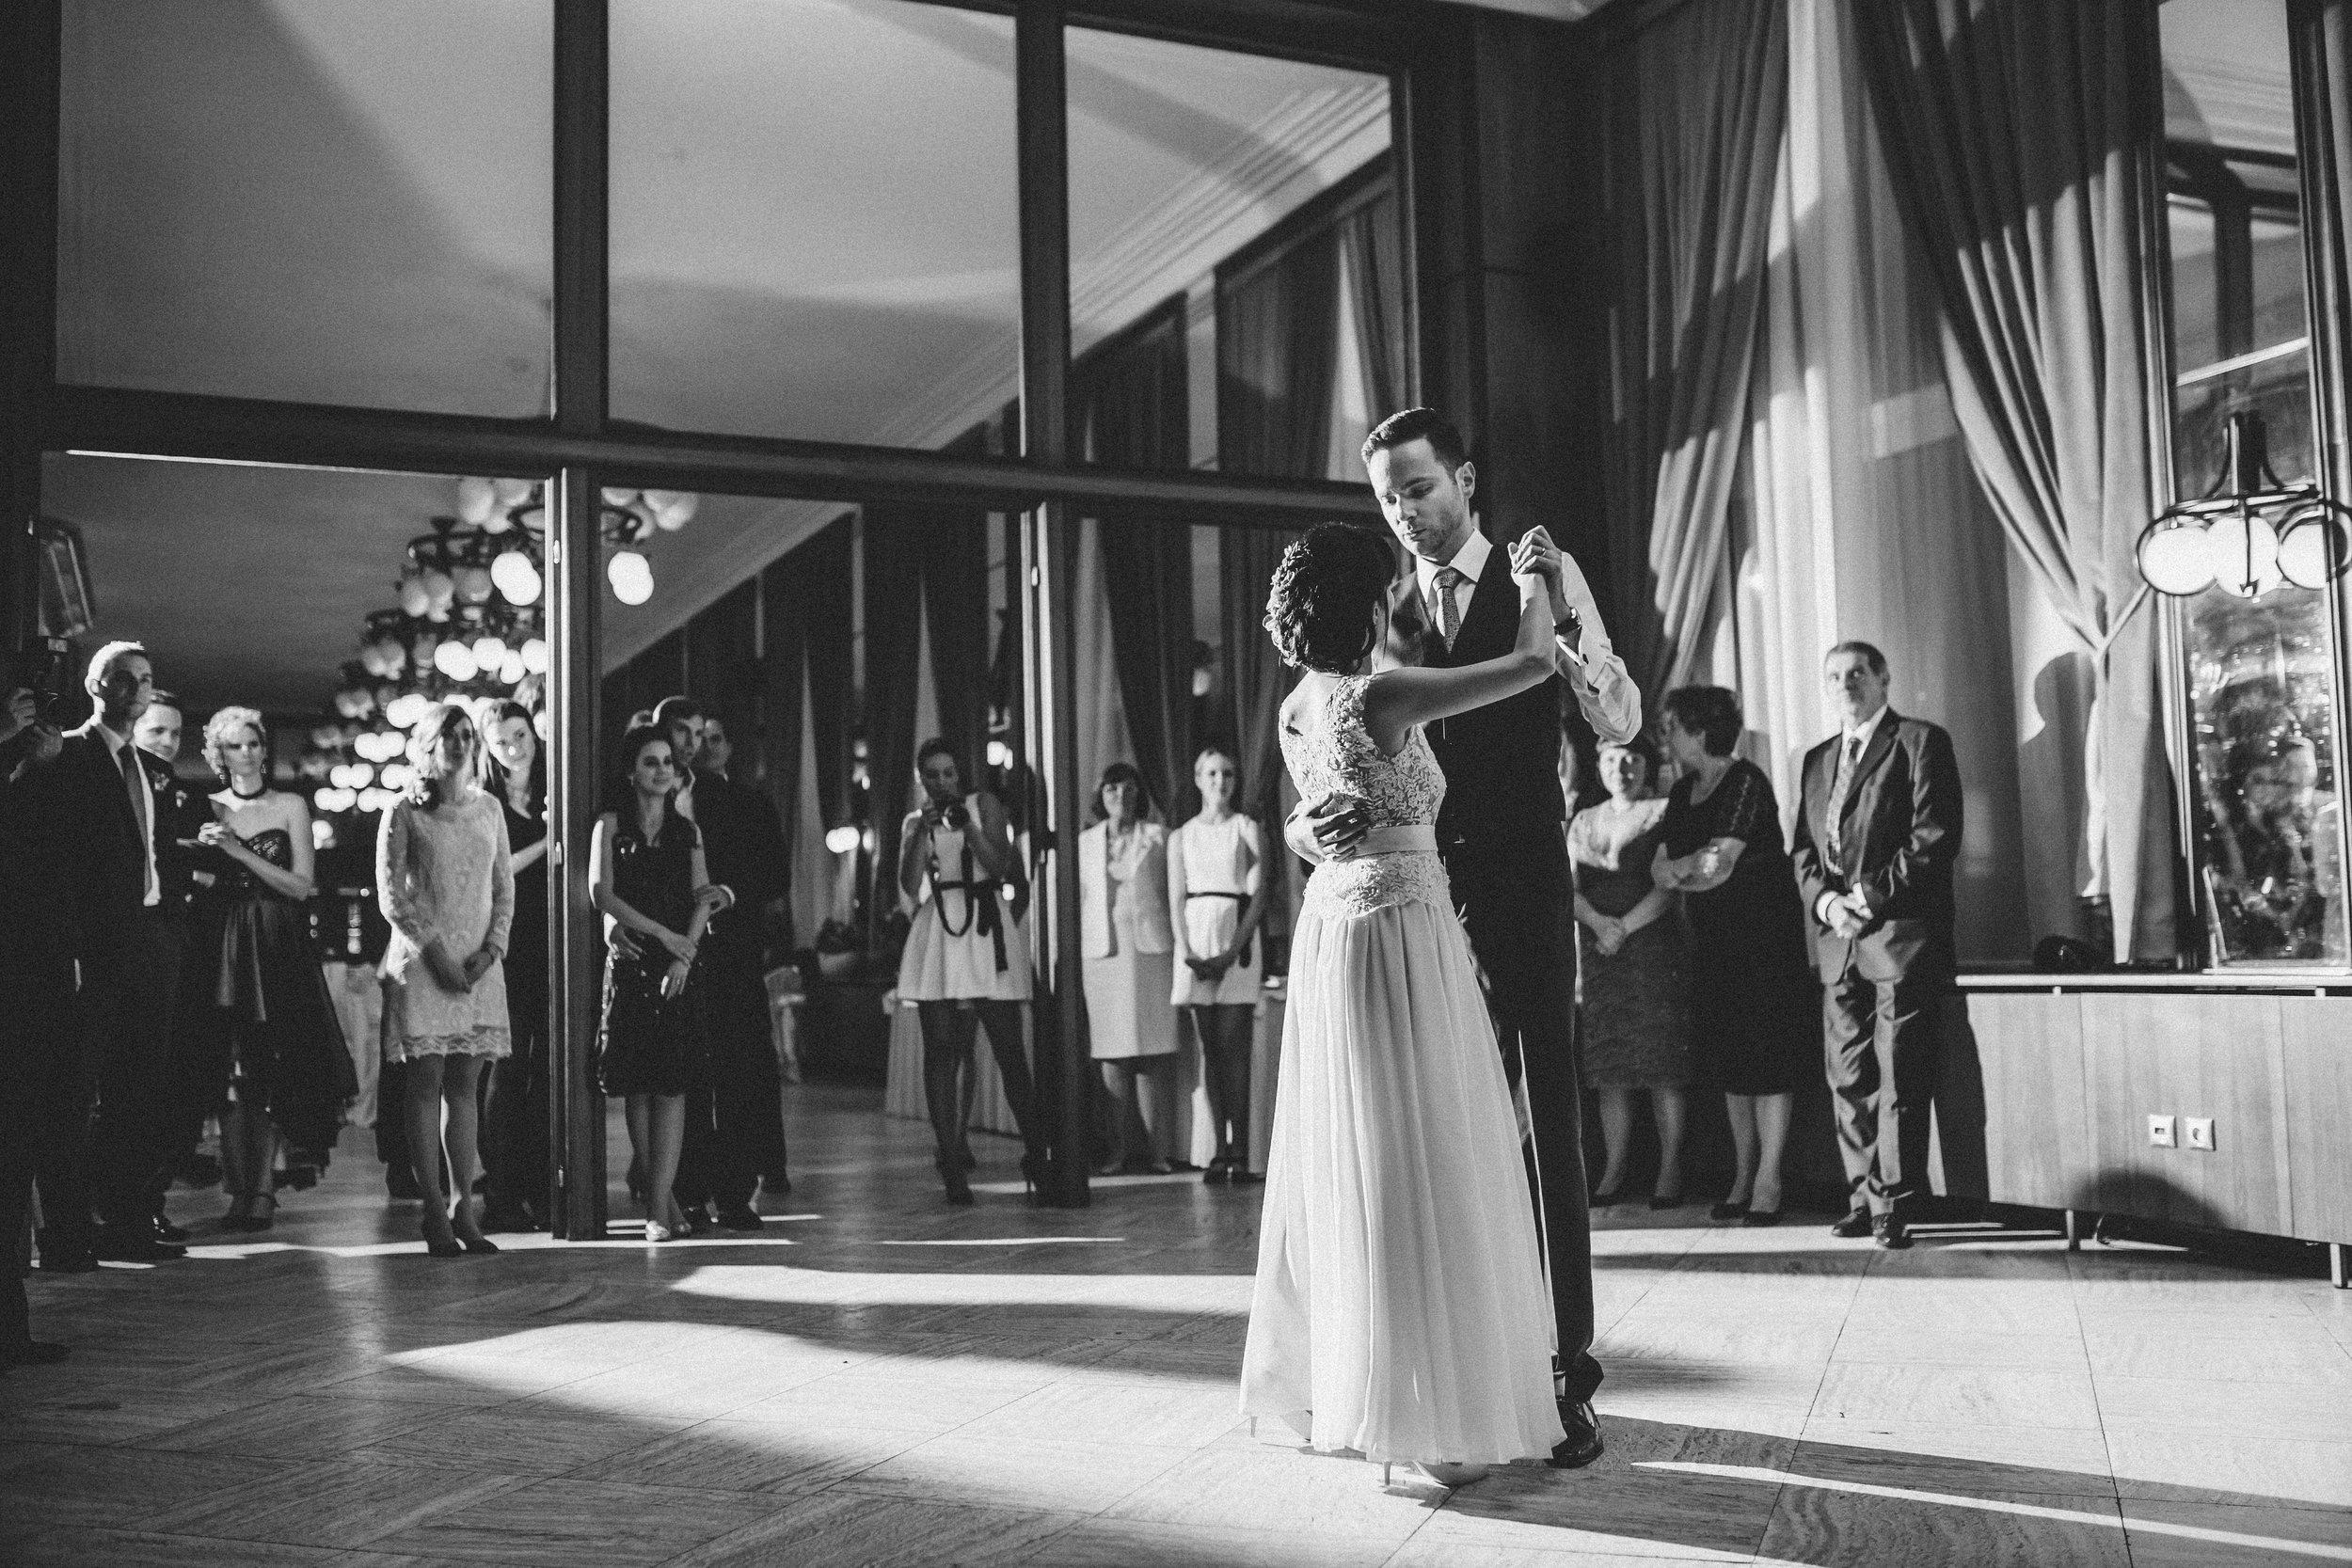 destination-wedding-photographer-slovakia-bratislava-bw-documentary-style-first-dance-1.jpg